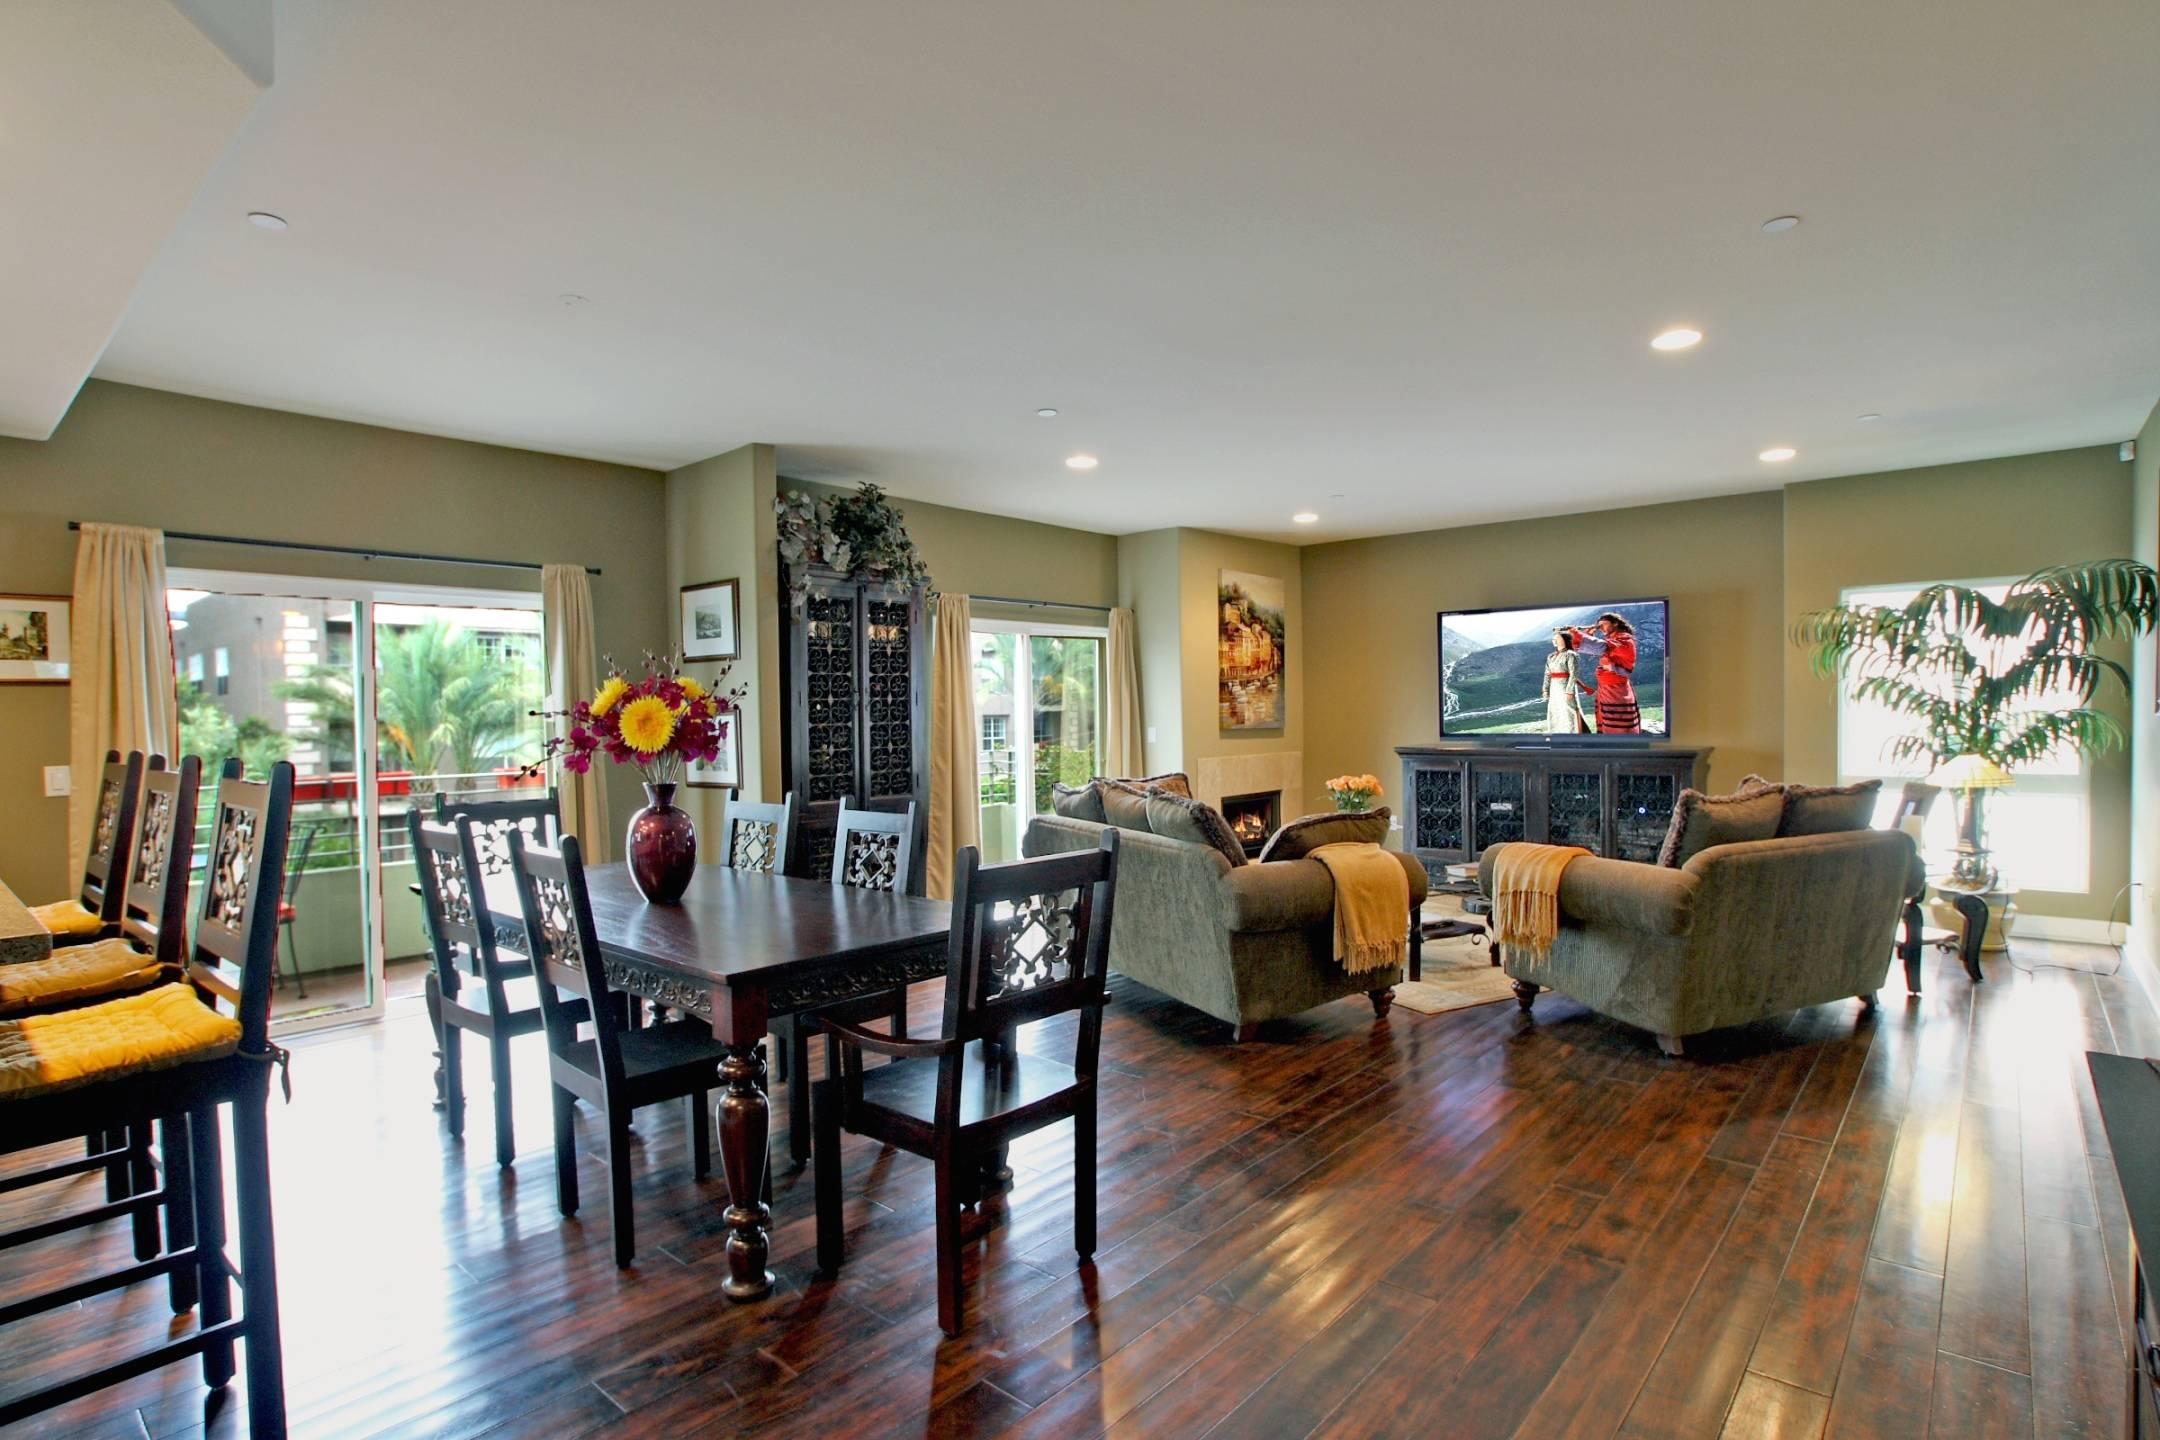 Best Kitchen Dining Room Open Floor Plan Design Ideas House Plans 167888